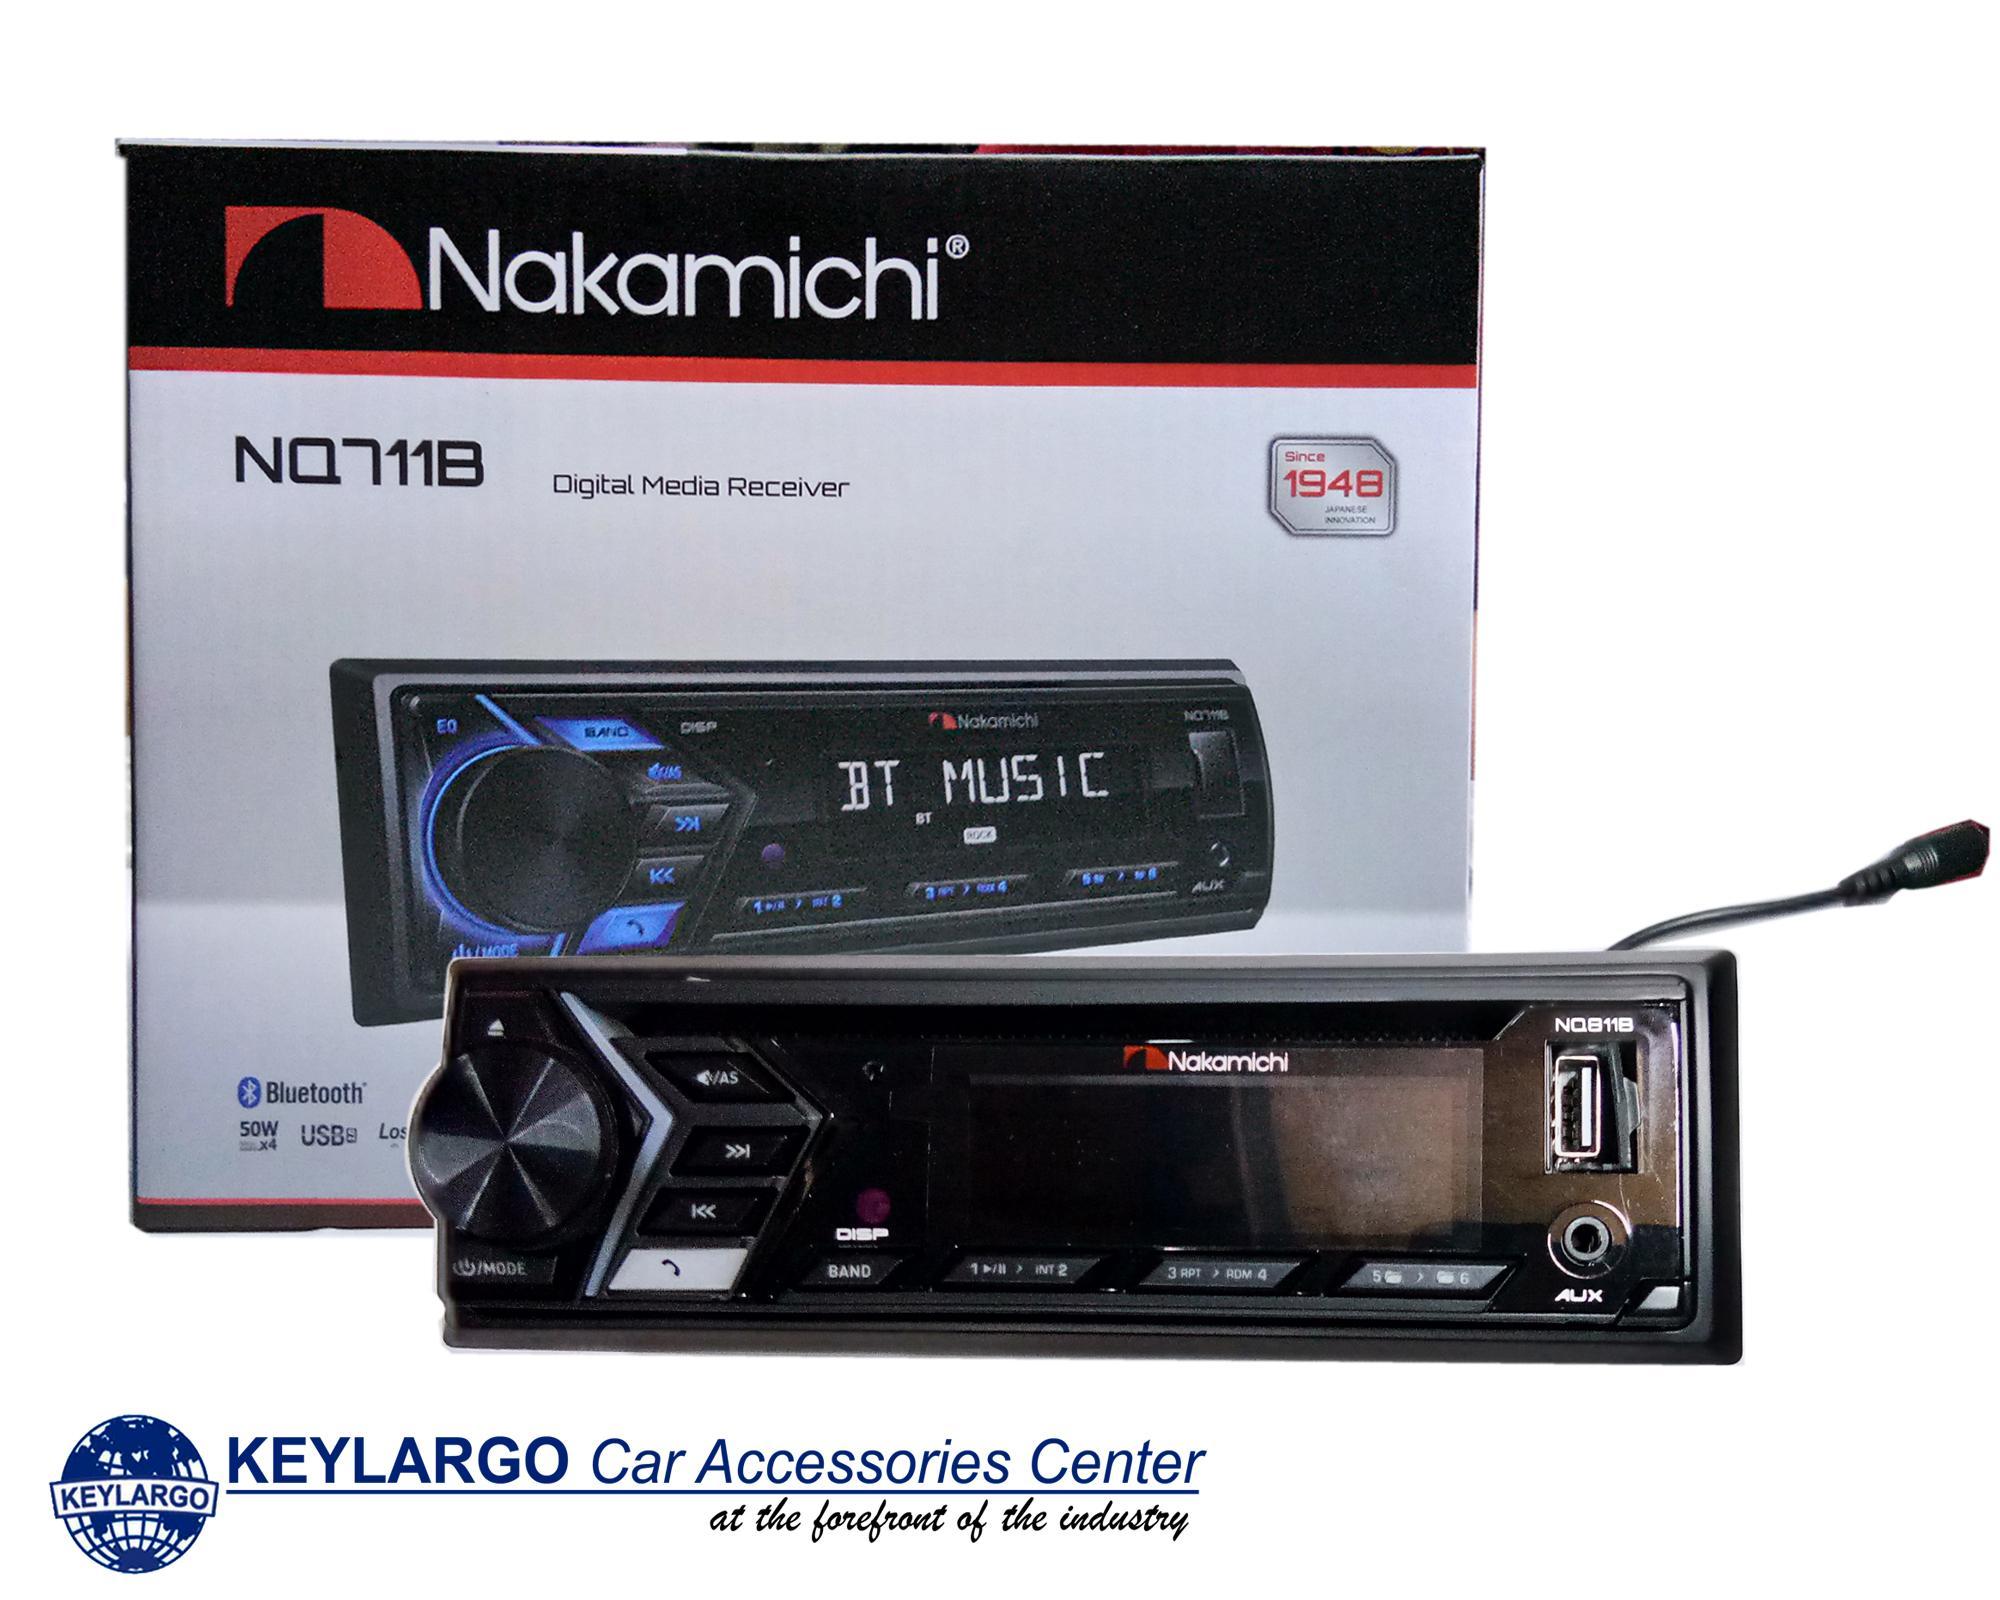 Nakamichi Philippines Price List Earphones Bluetooth My Mini Plus Speaker With Fm Radio Pink Keylargo Head Unit 1 Din Deck